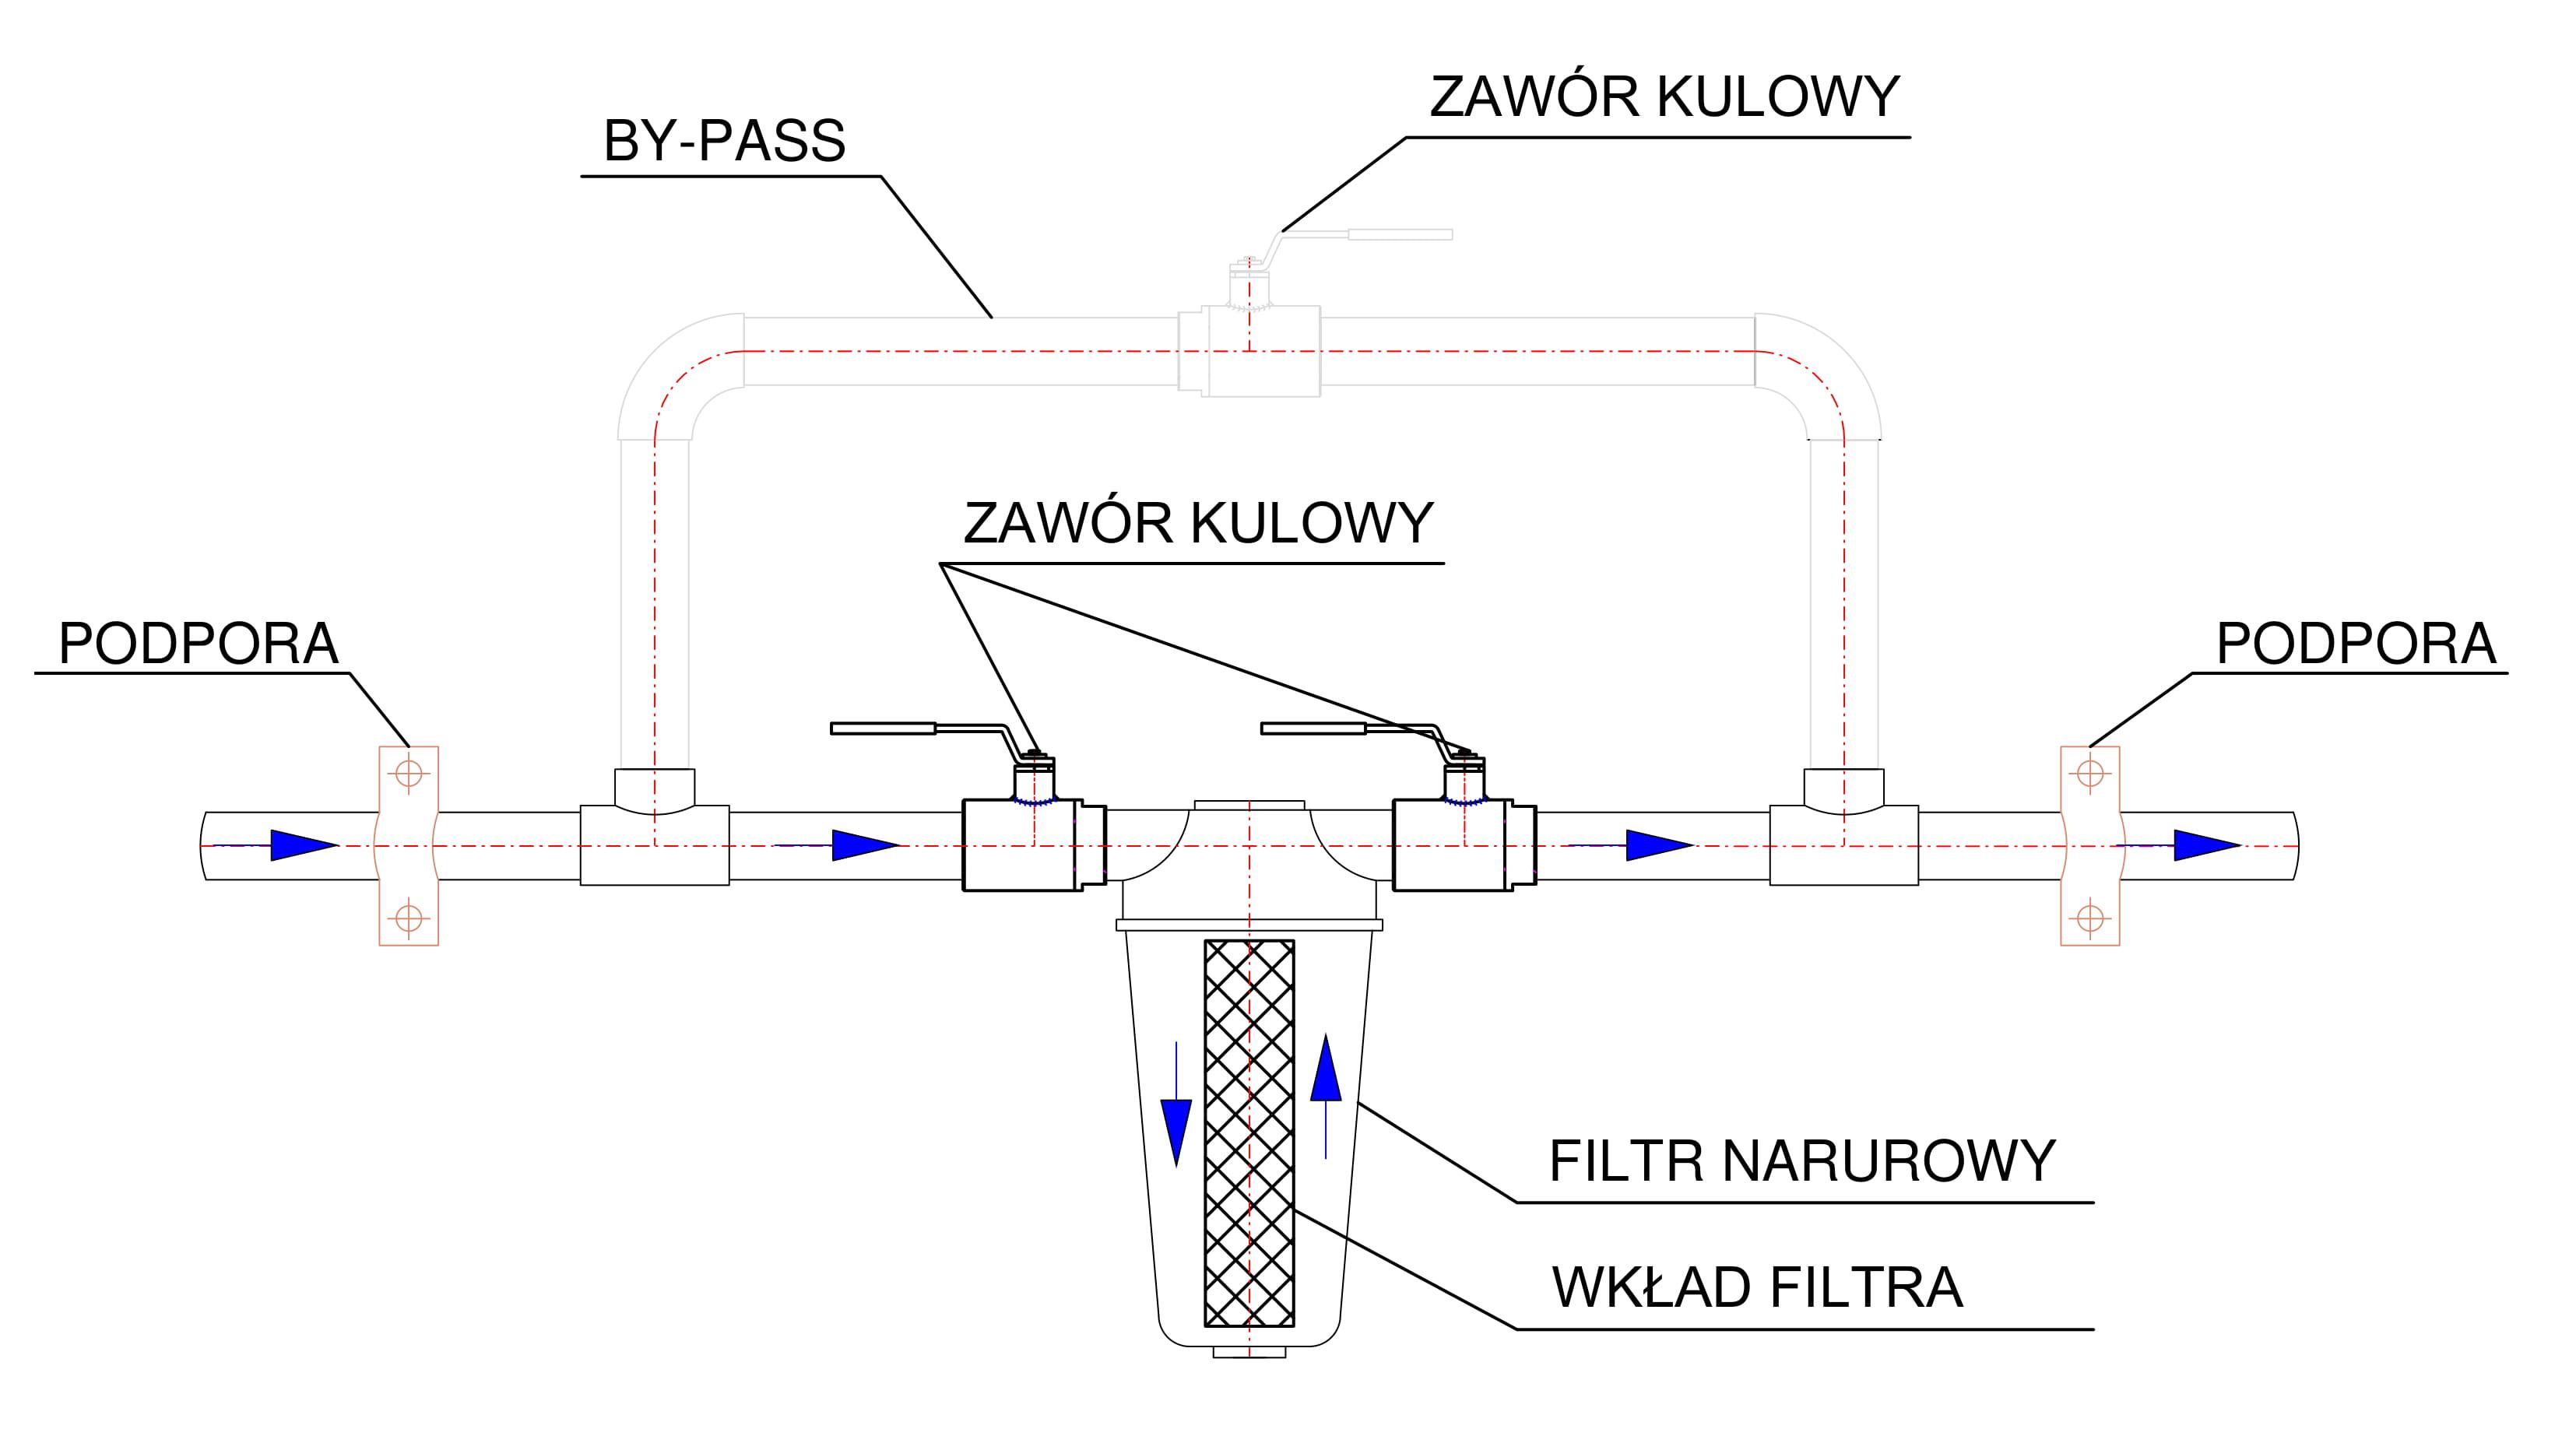 Filtr narurowy - montaż